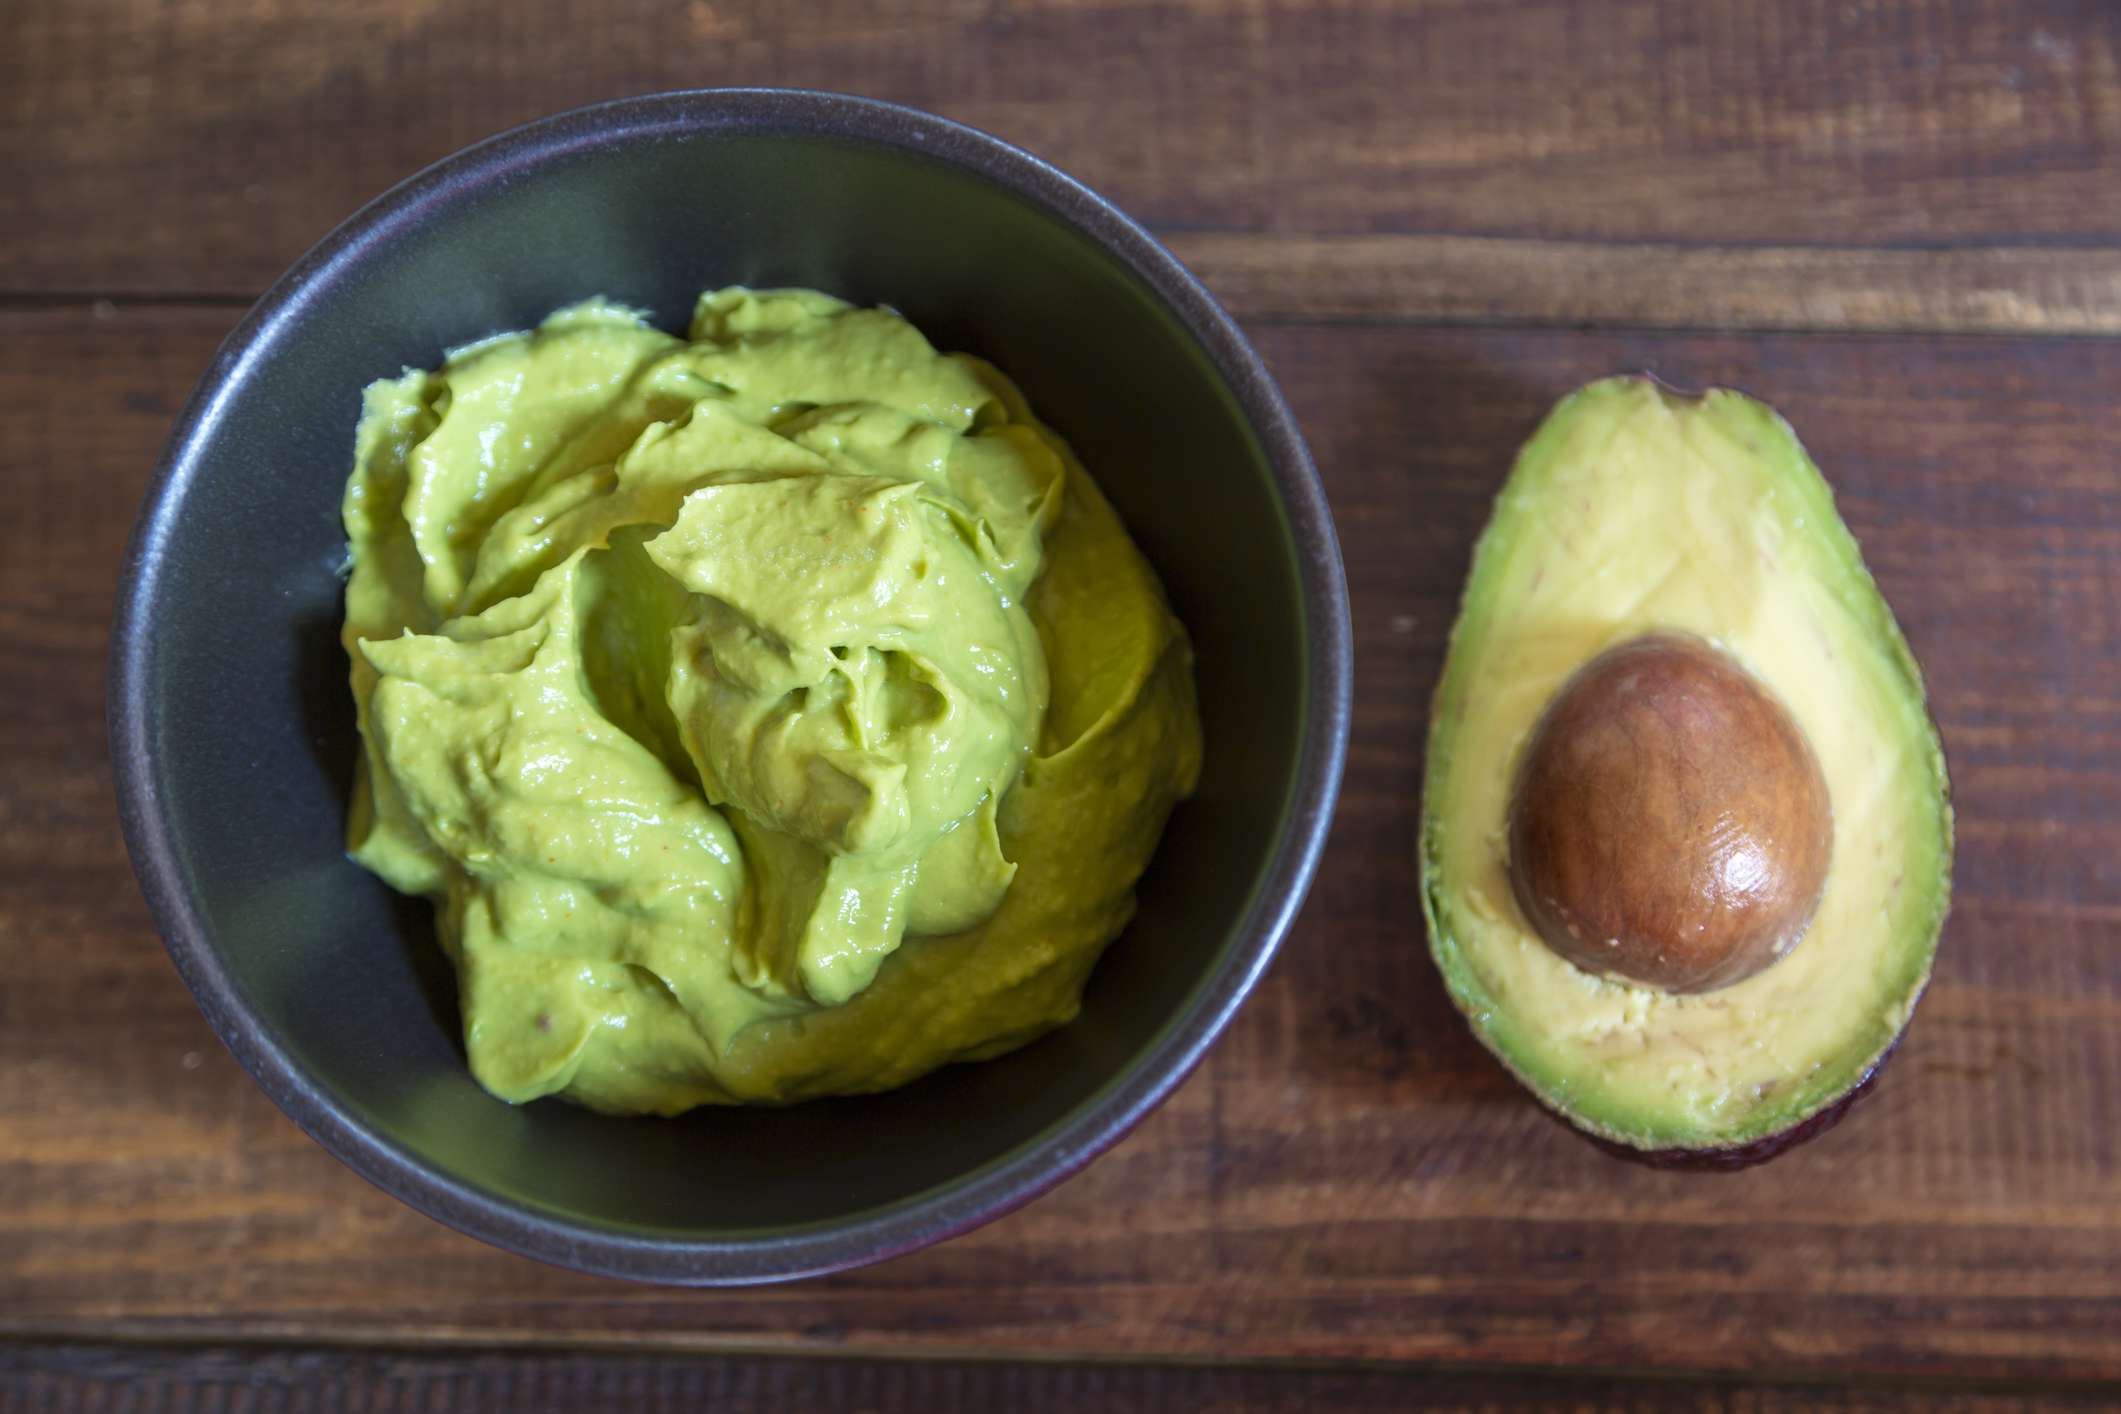 How to Make Avocado Baby Food